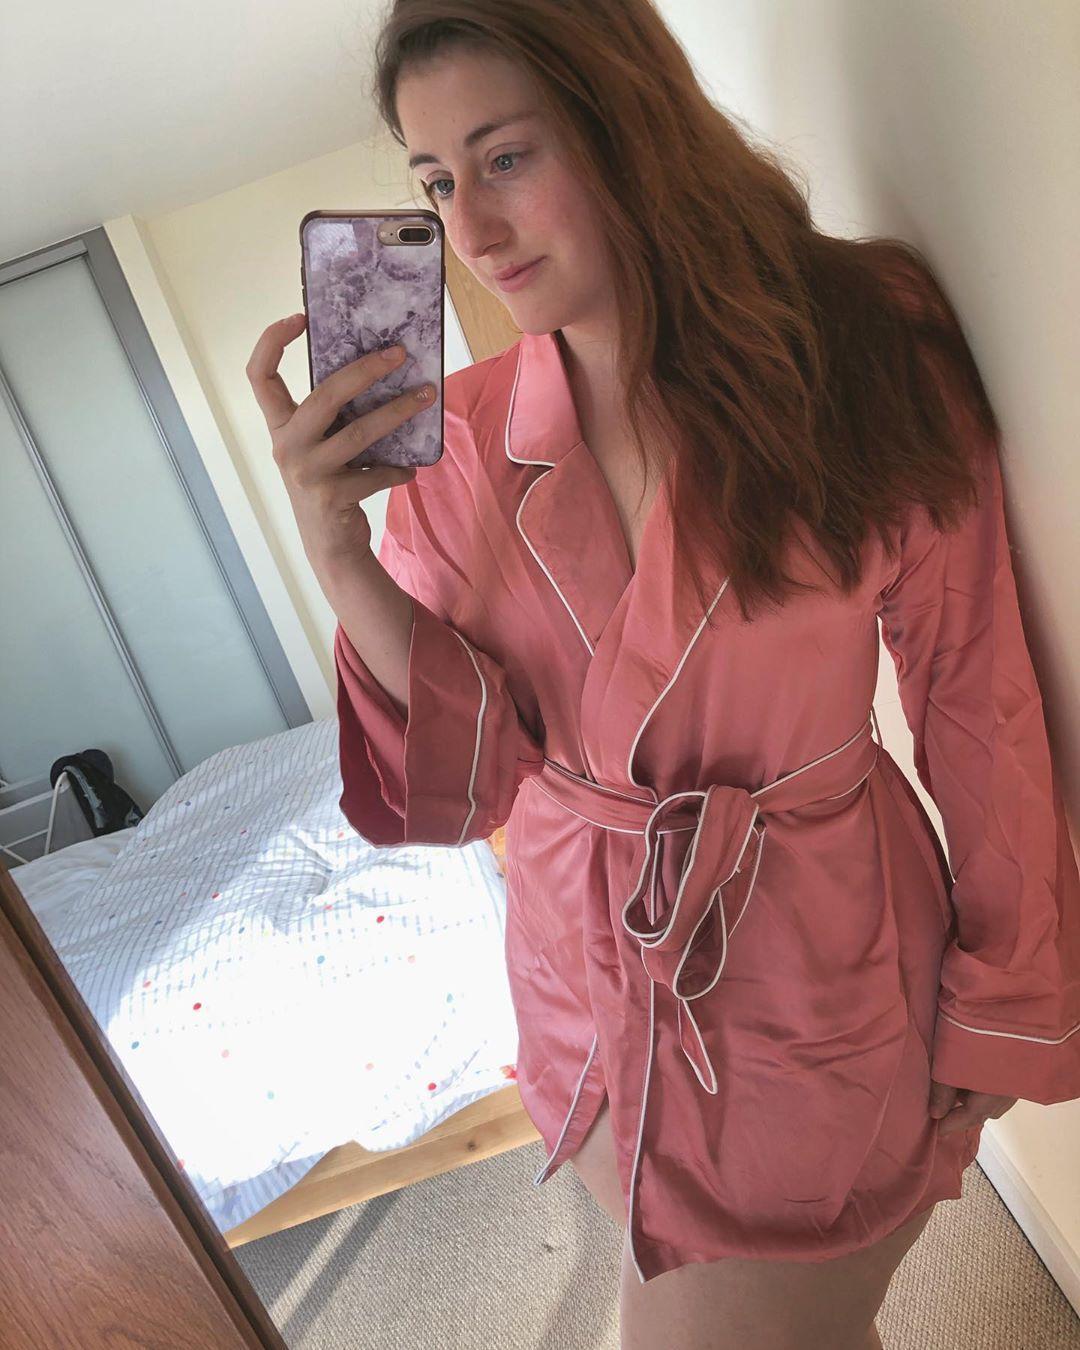 Sunny beautiful mornings ☀️💕💋 @missguided #iwokeuplikethis . . . . .  #love #life #silkdressinggown...